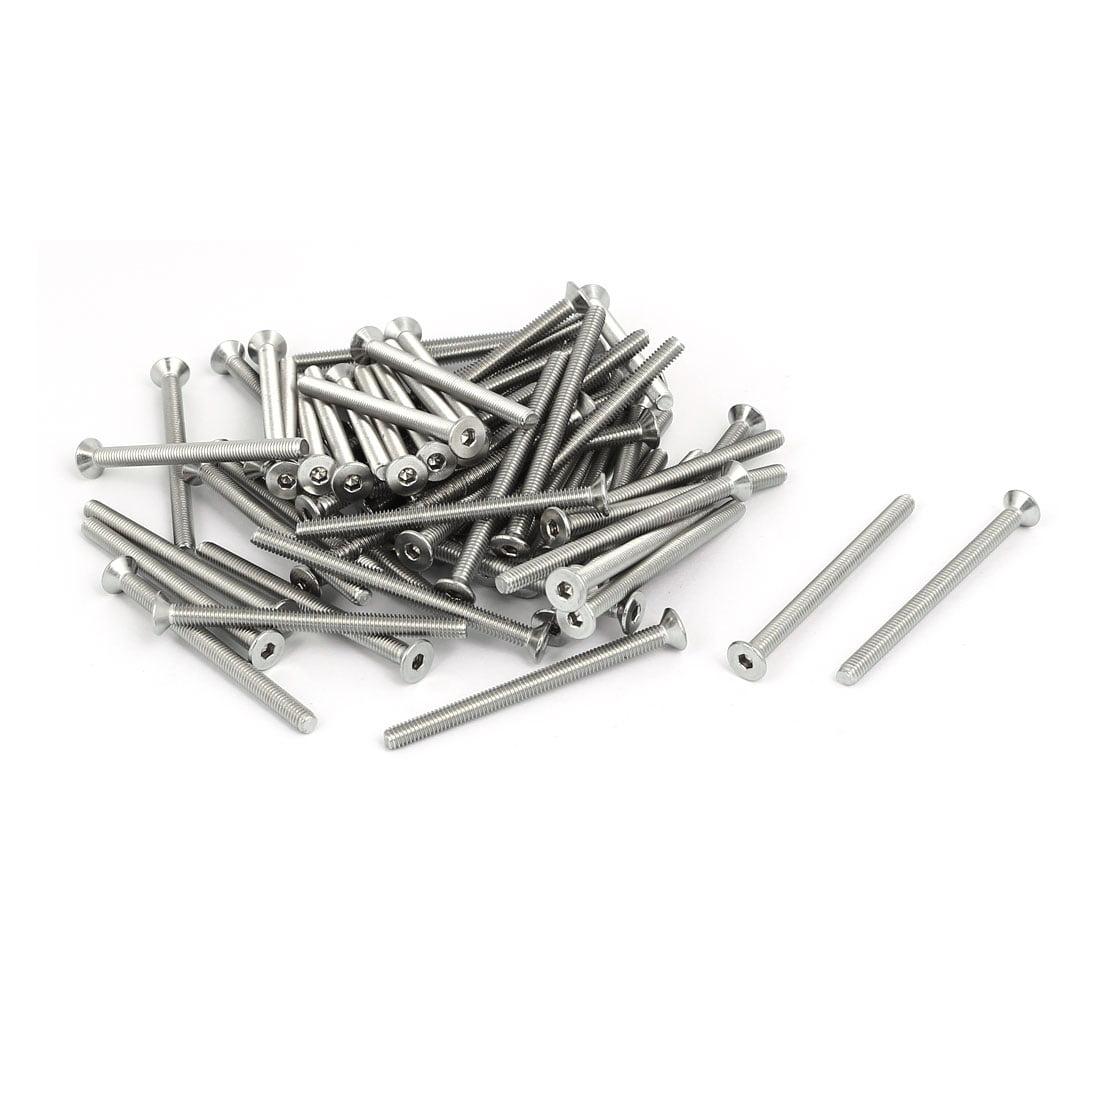 M4x55mm 304 Stainless Steel Flat Head Hex Socket Screws DIN7991 65pcs - image 4 de 4